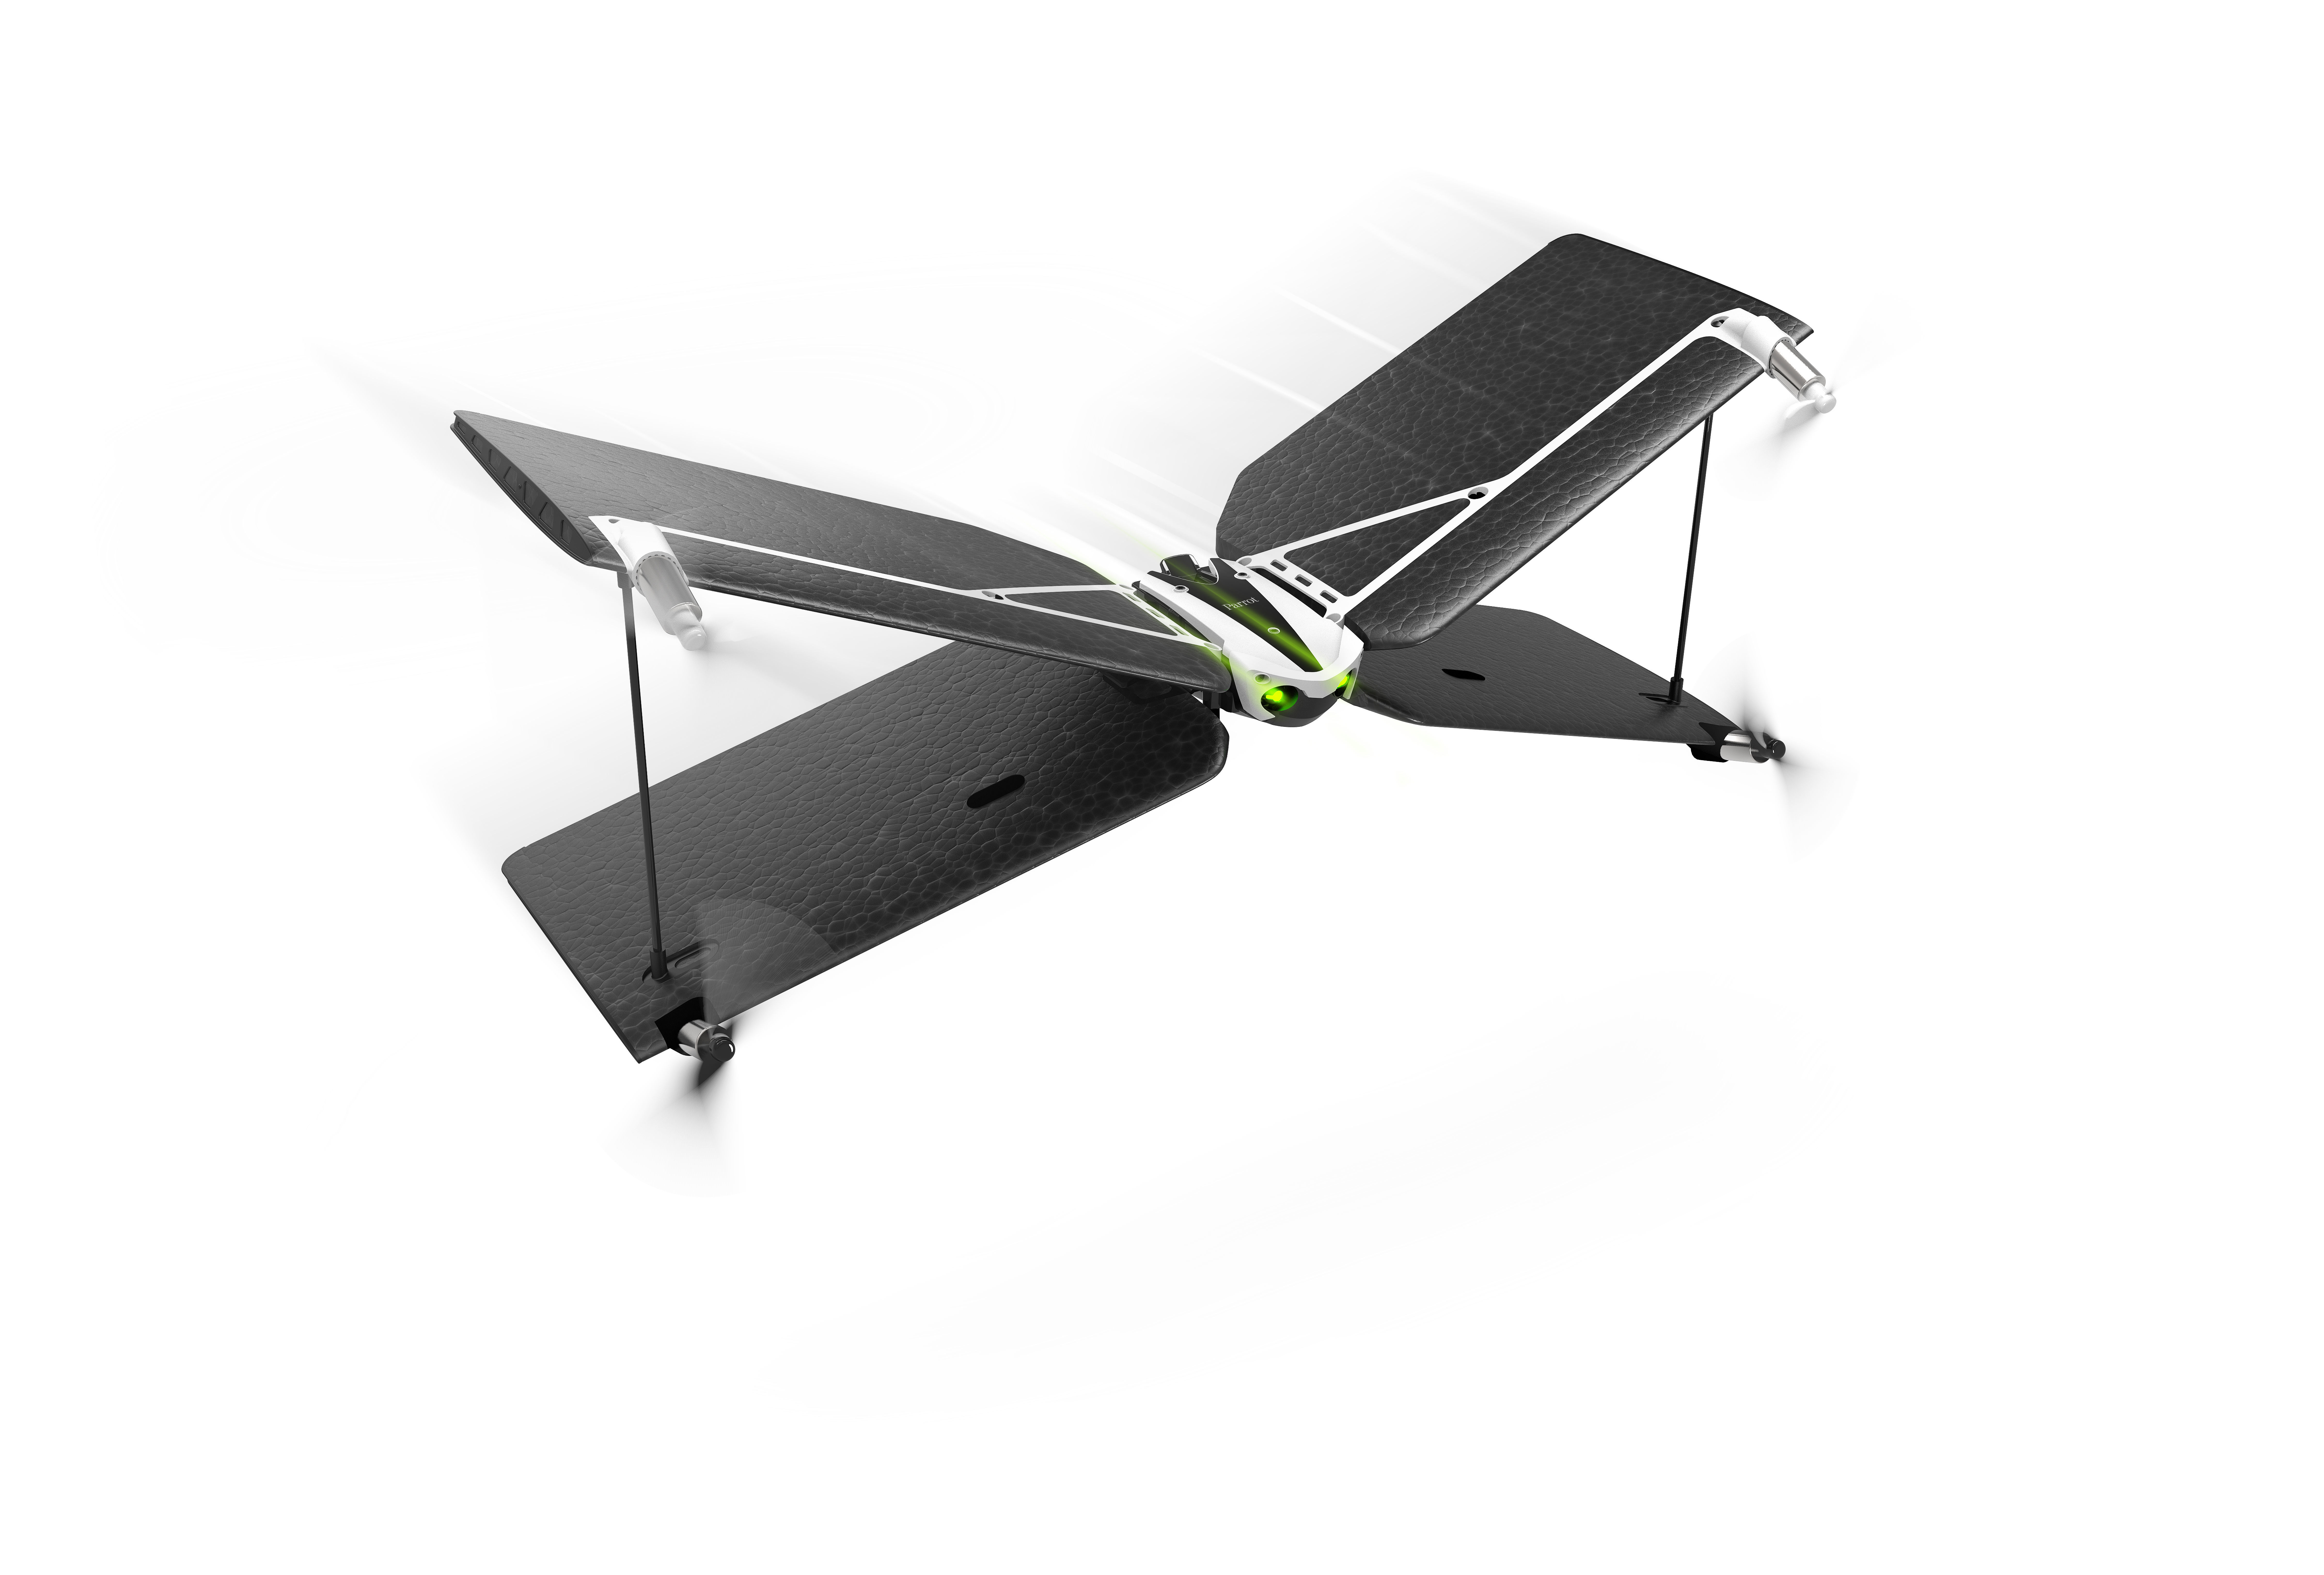 Mini drone Swing + Radiocommande Flypad - PF727003 - Noir et Blanc